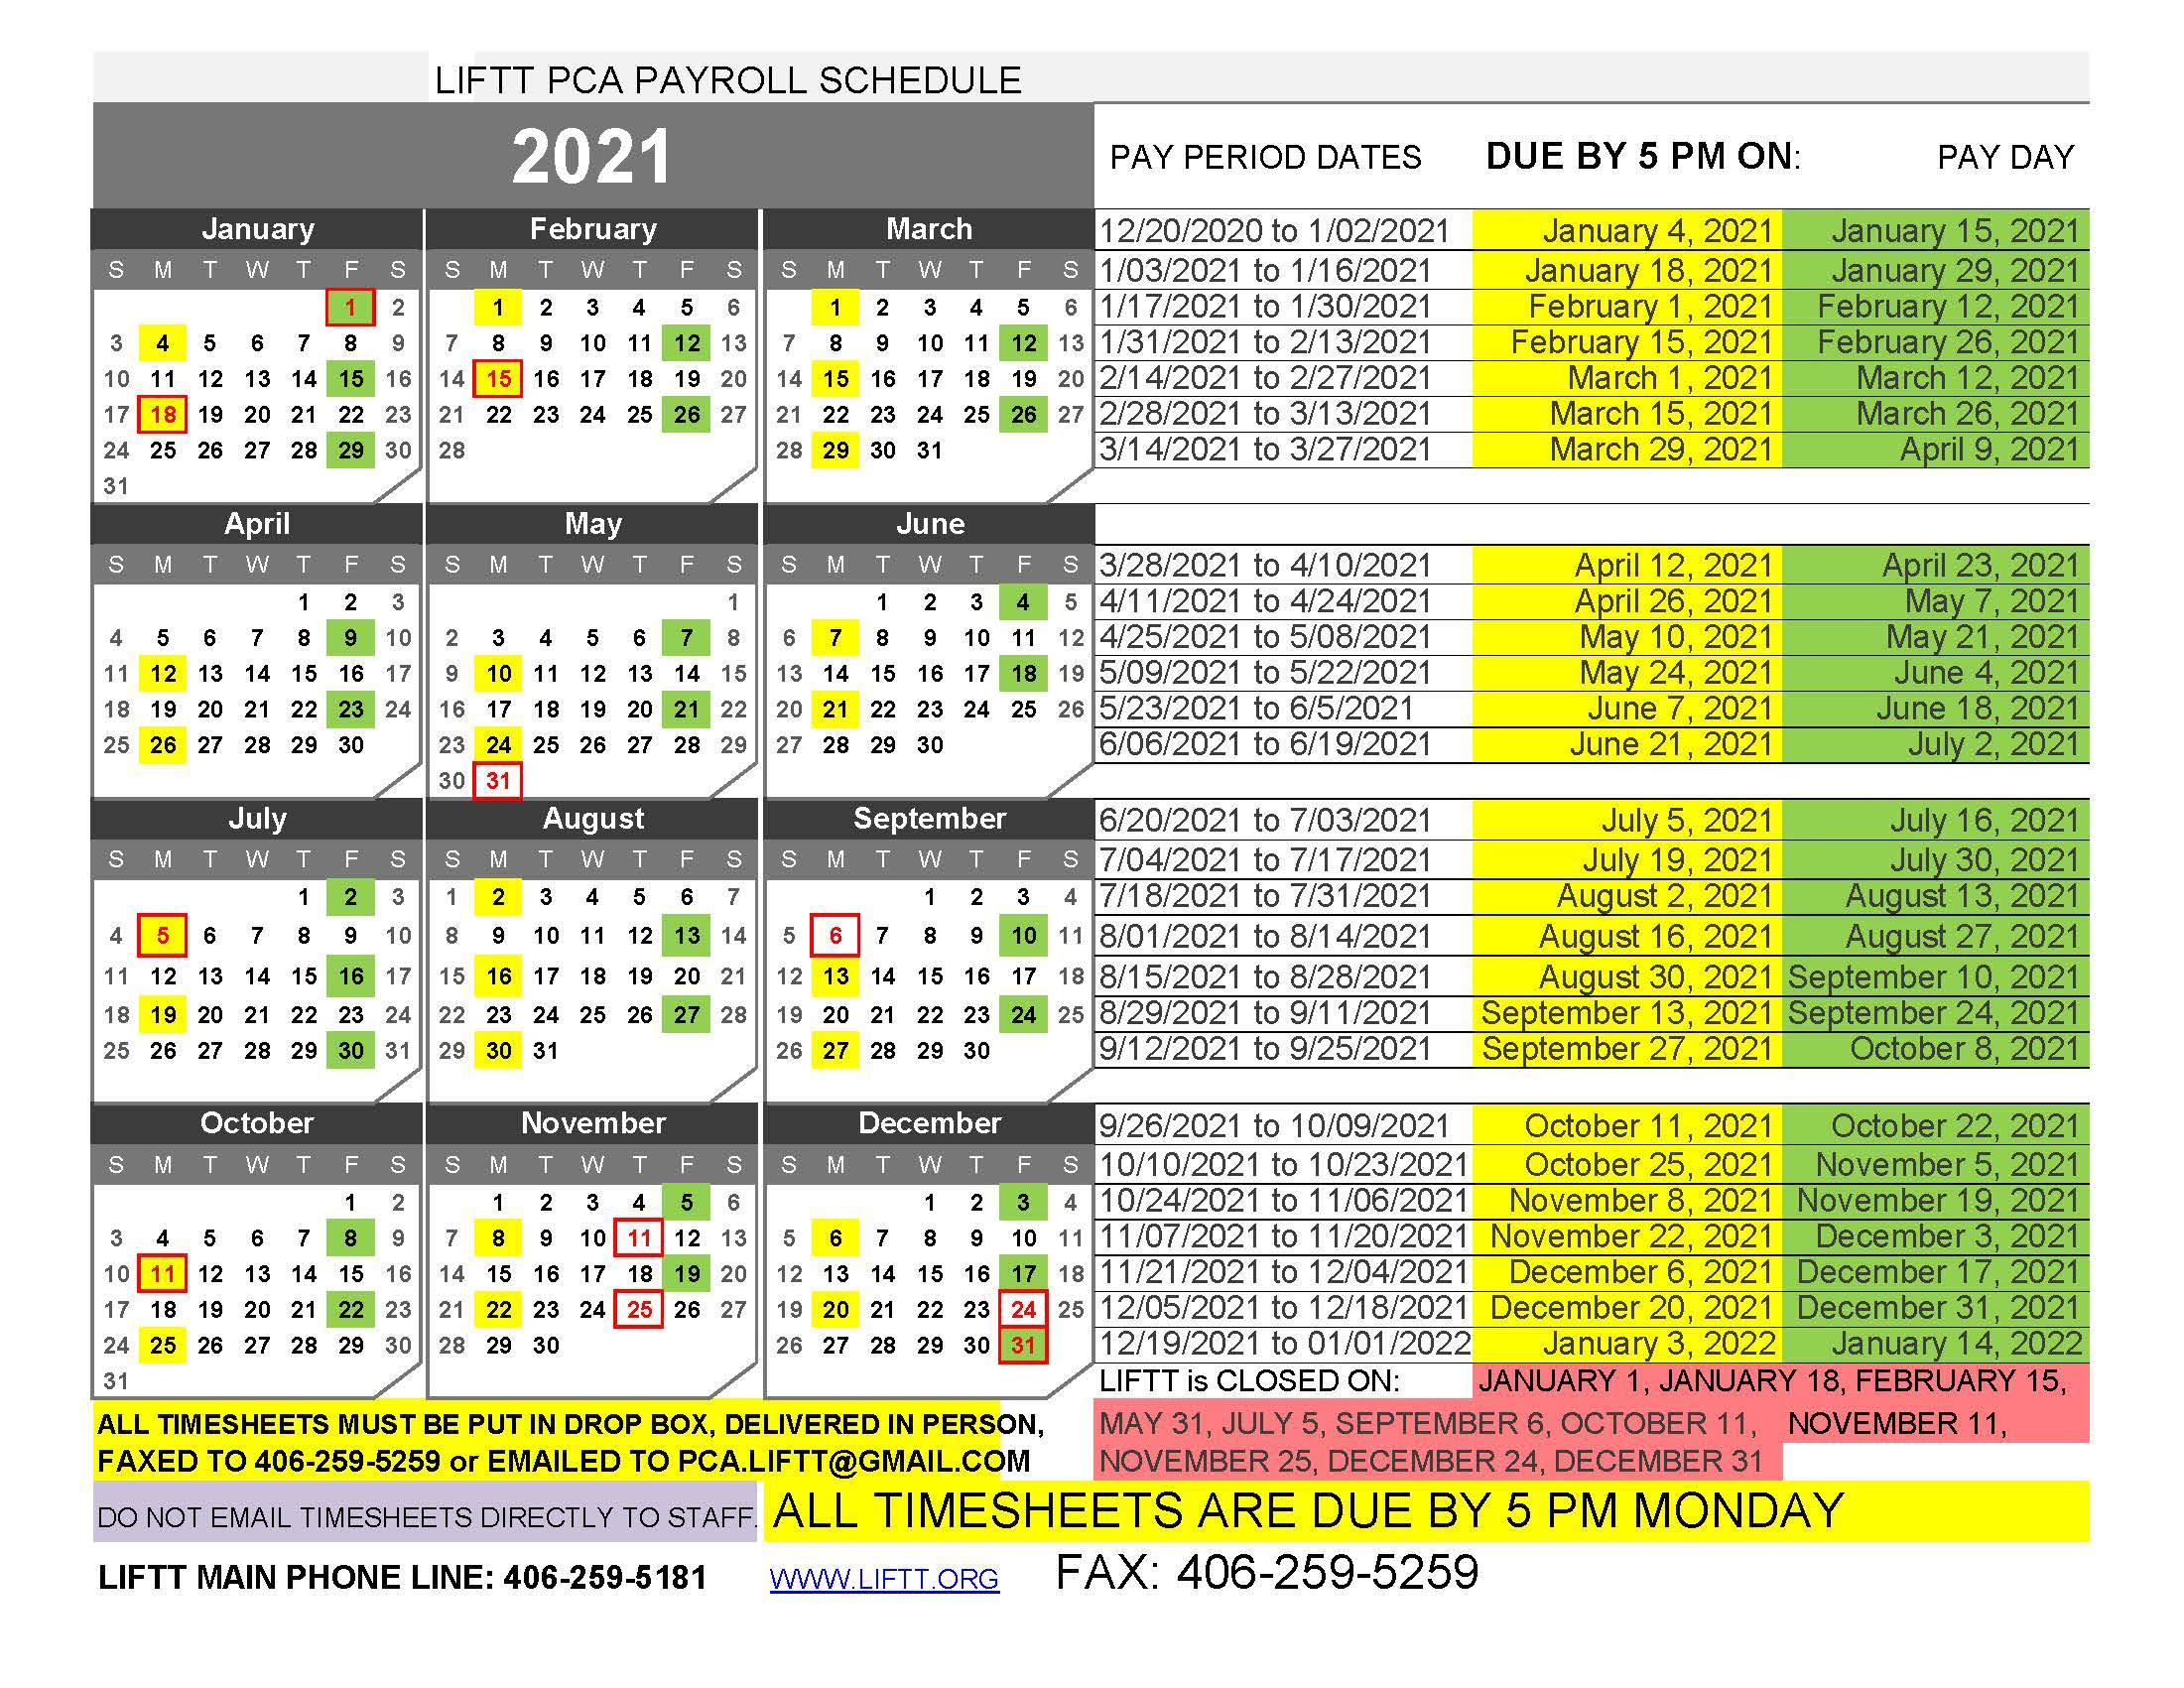 26 Pay Period Calendar 2021 : Doi Payroll Calendar 2021